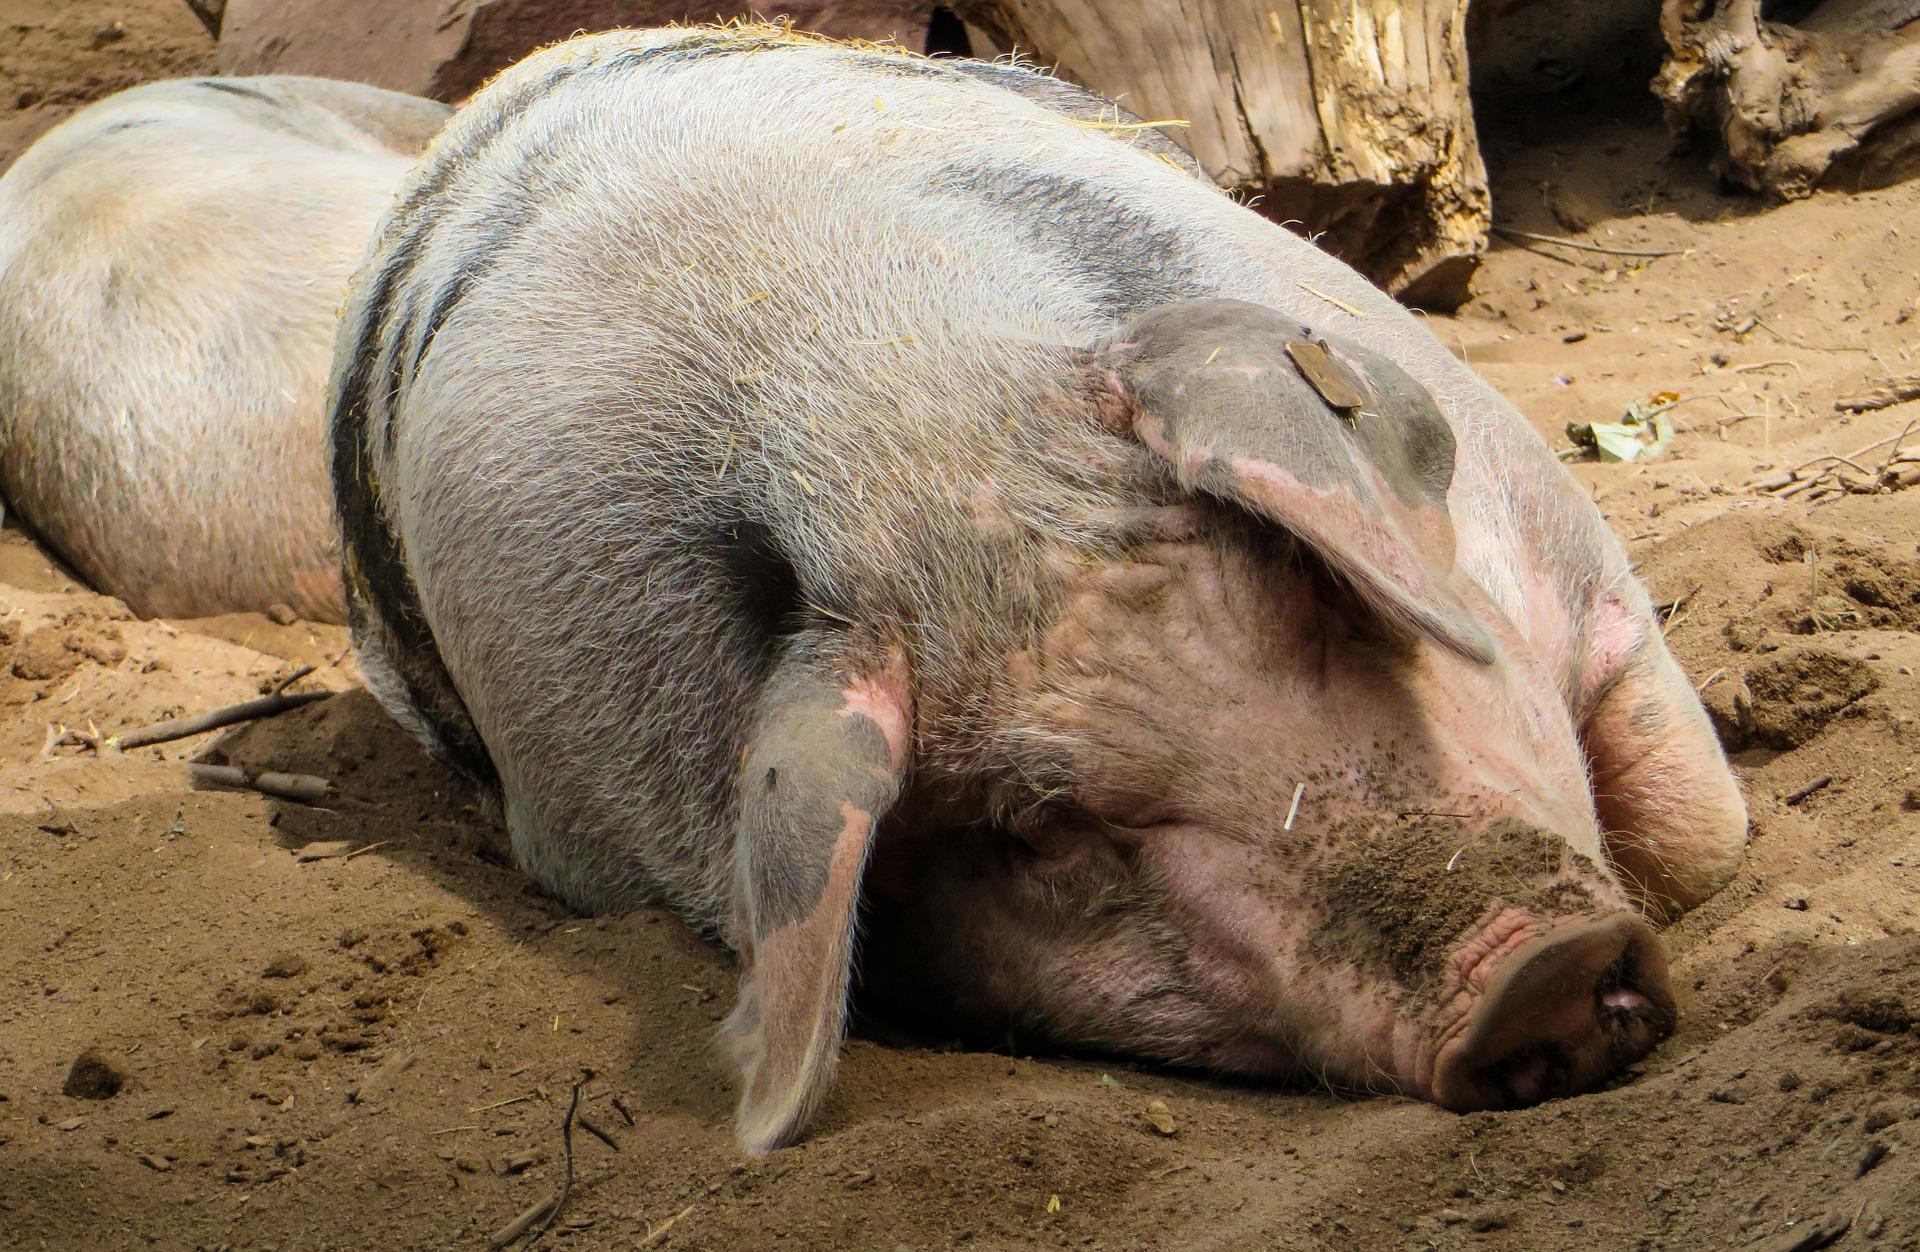 Pig farm photo